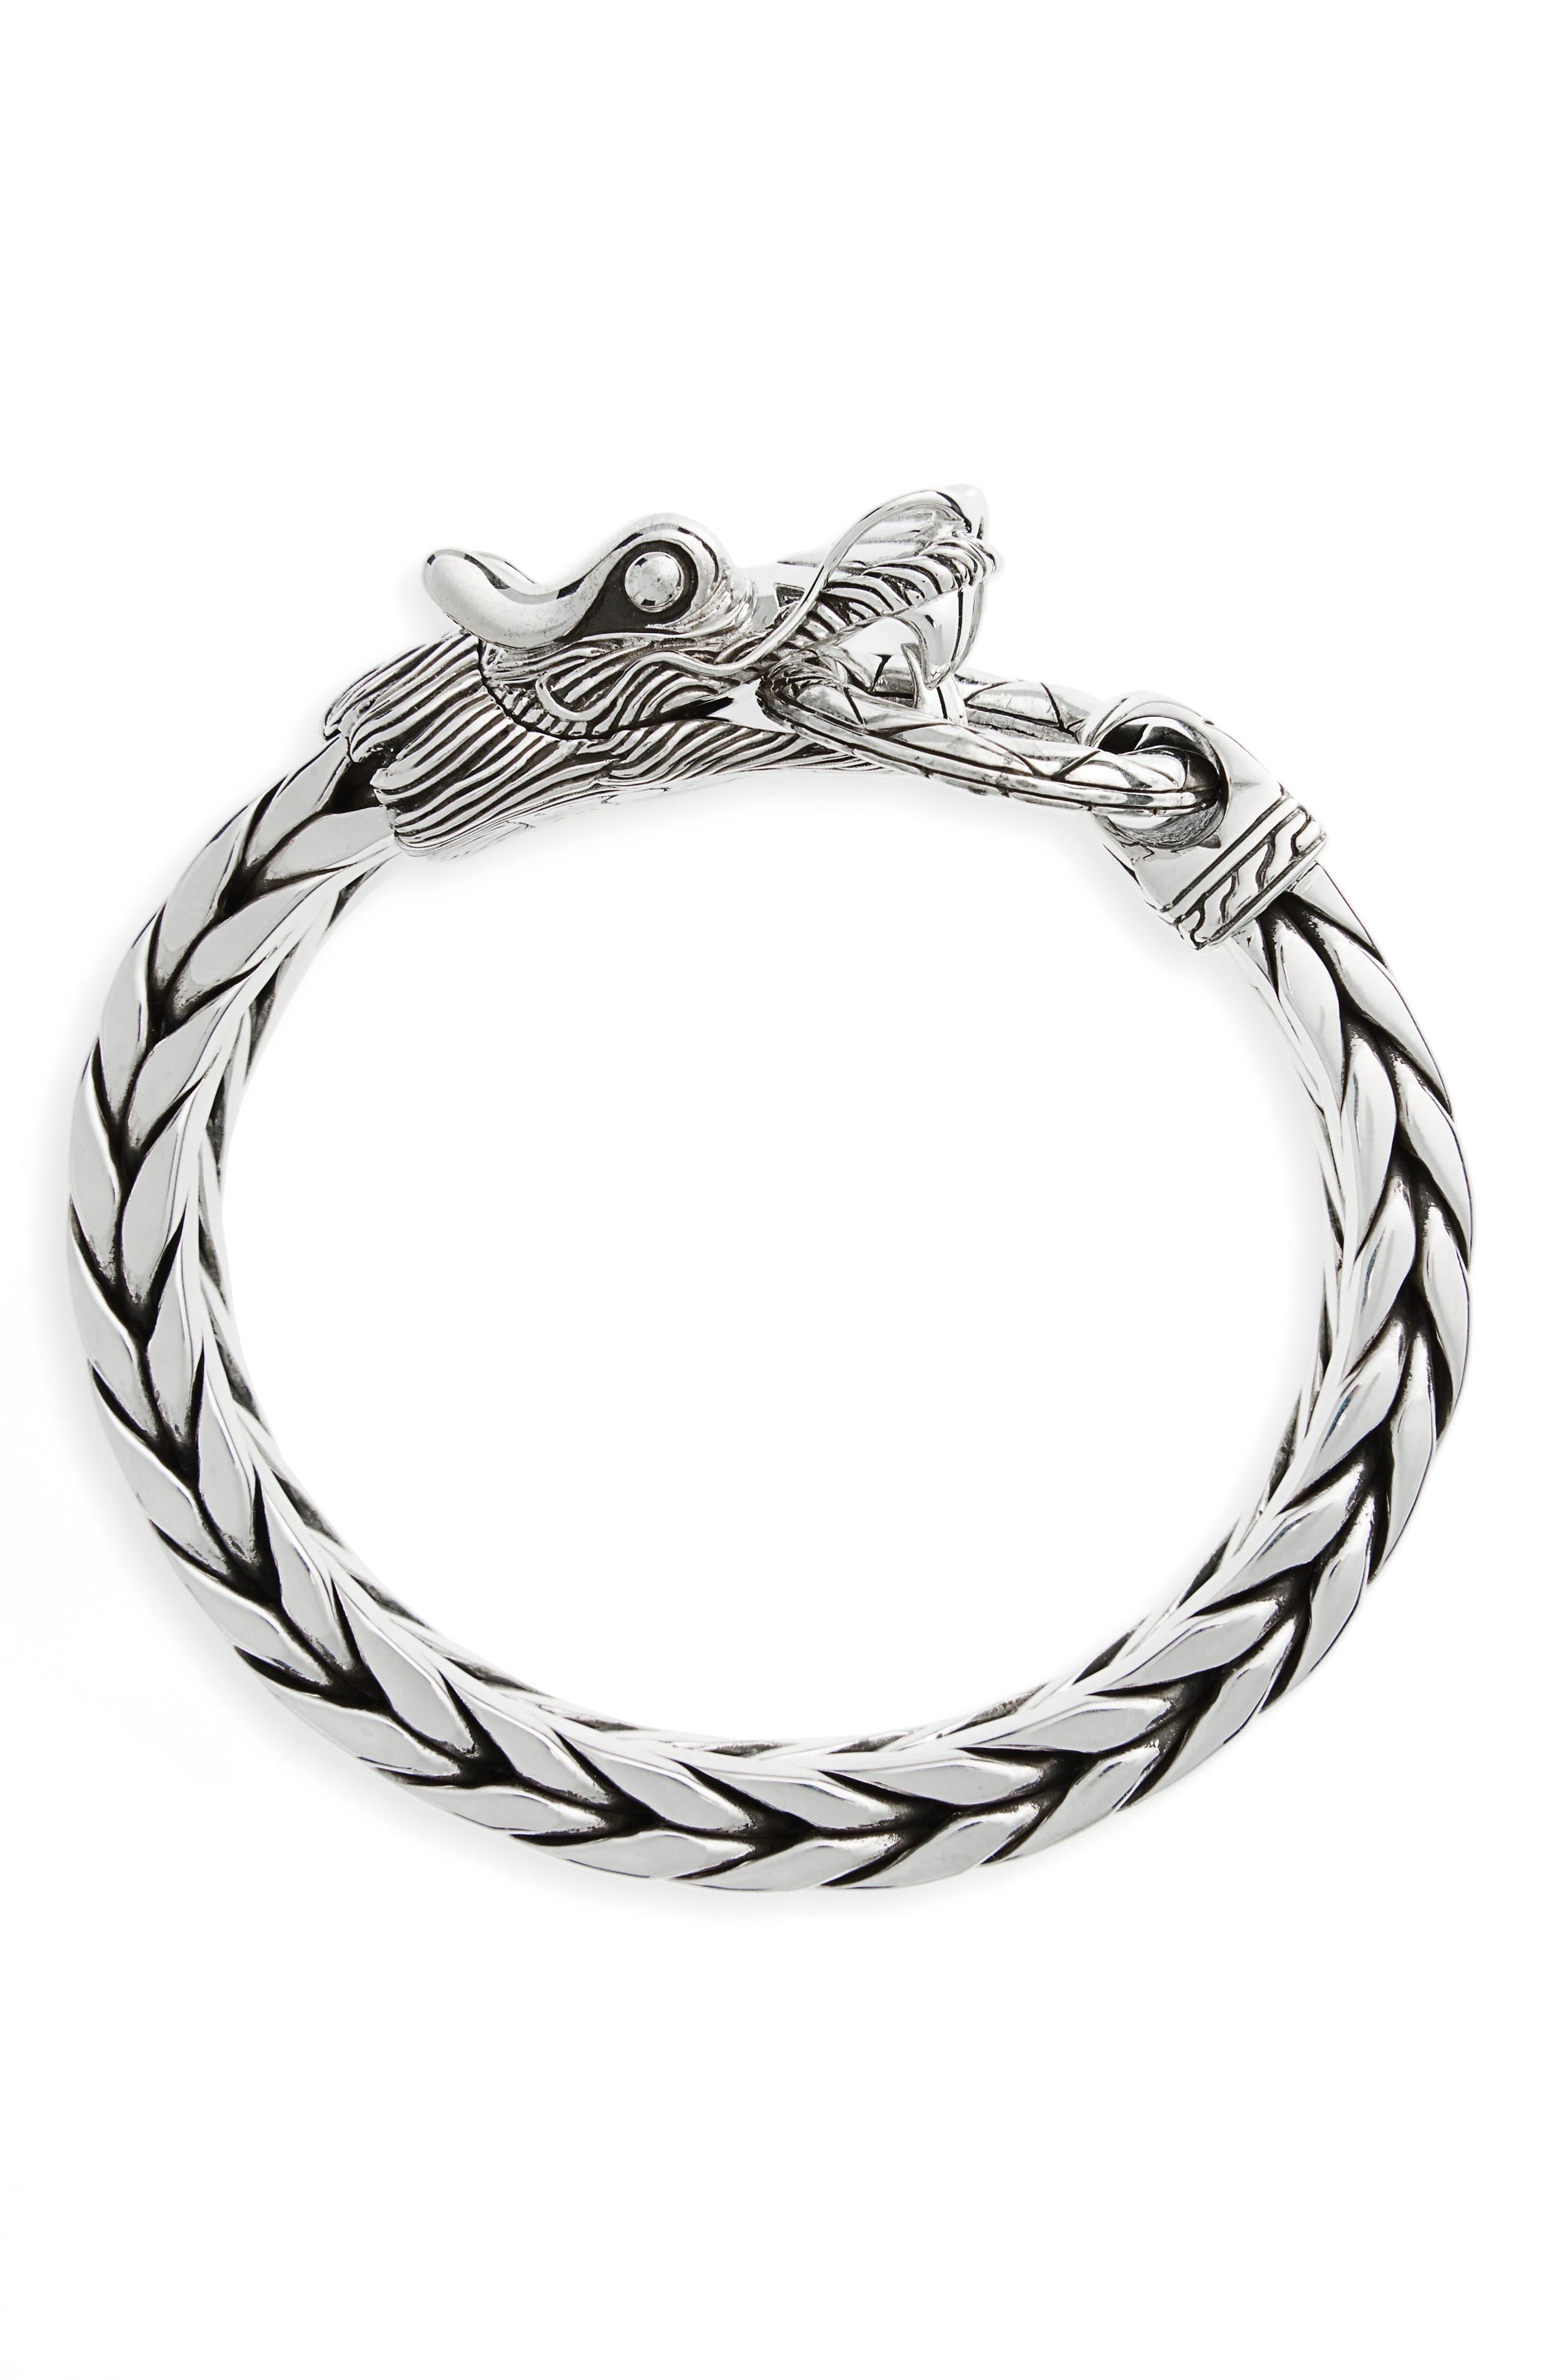 Legends Naga Dragon Head Bracelet,                             Main thumbnail 1, color,                             Silver